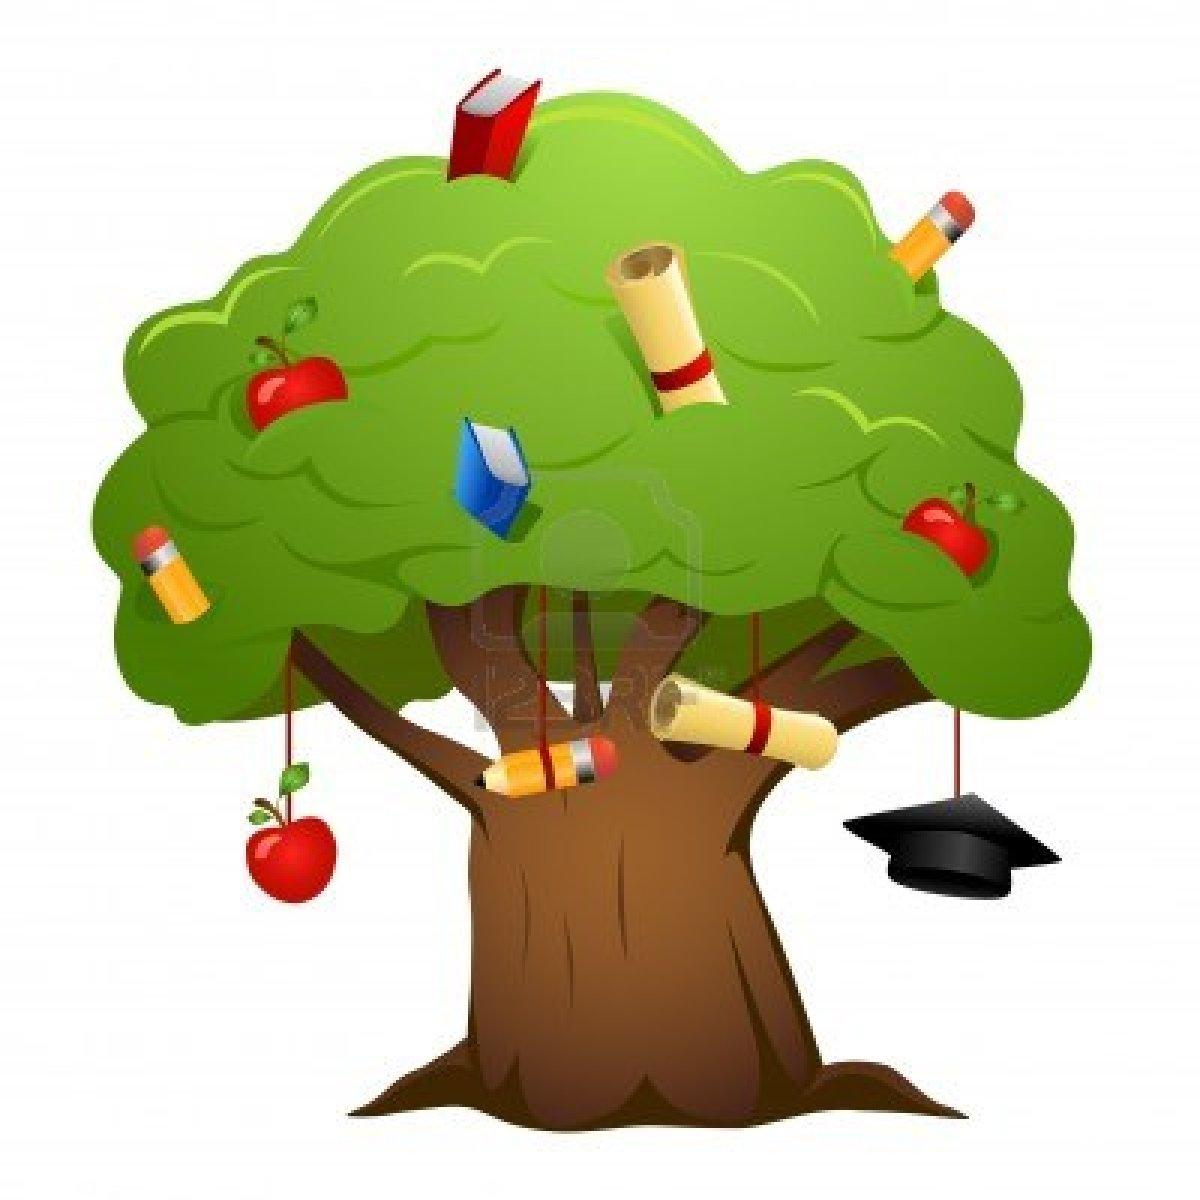 77436-college-education-clip-art.jpg